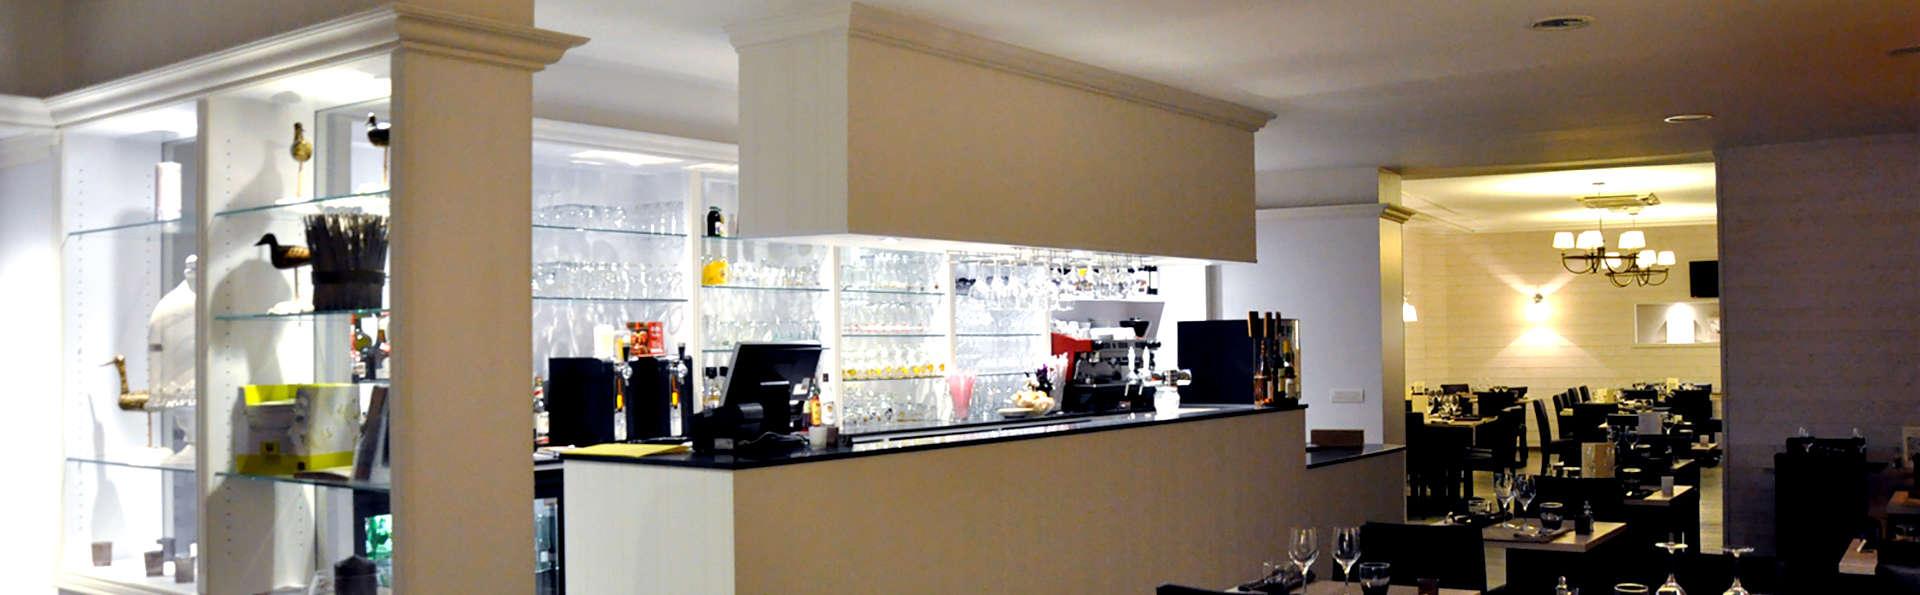 Hôtel du Port et Restaurant des Bains - Edit_Restaurant3.jpg